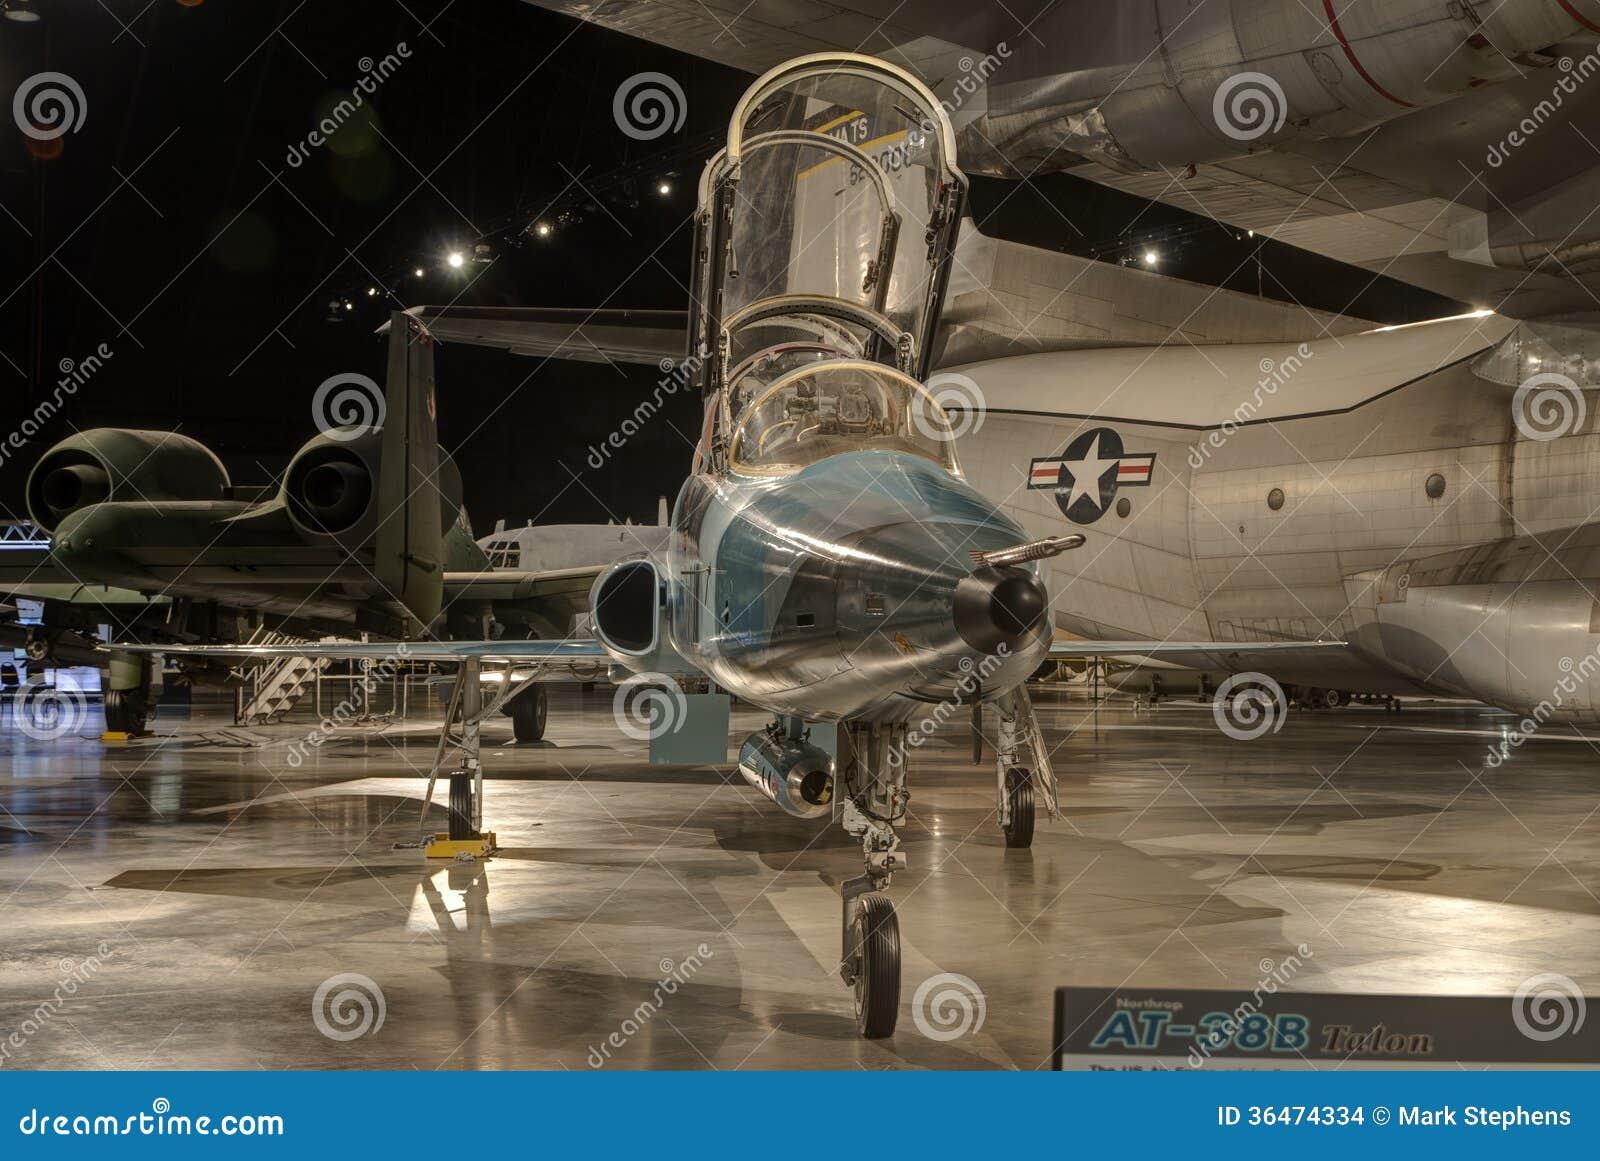 Planes at the USAF Museum, Dayton, Ohio